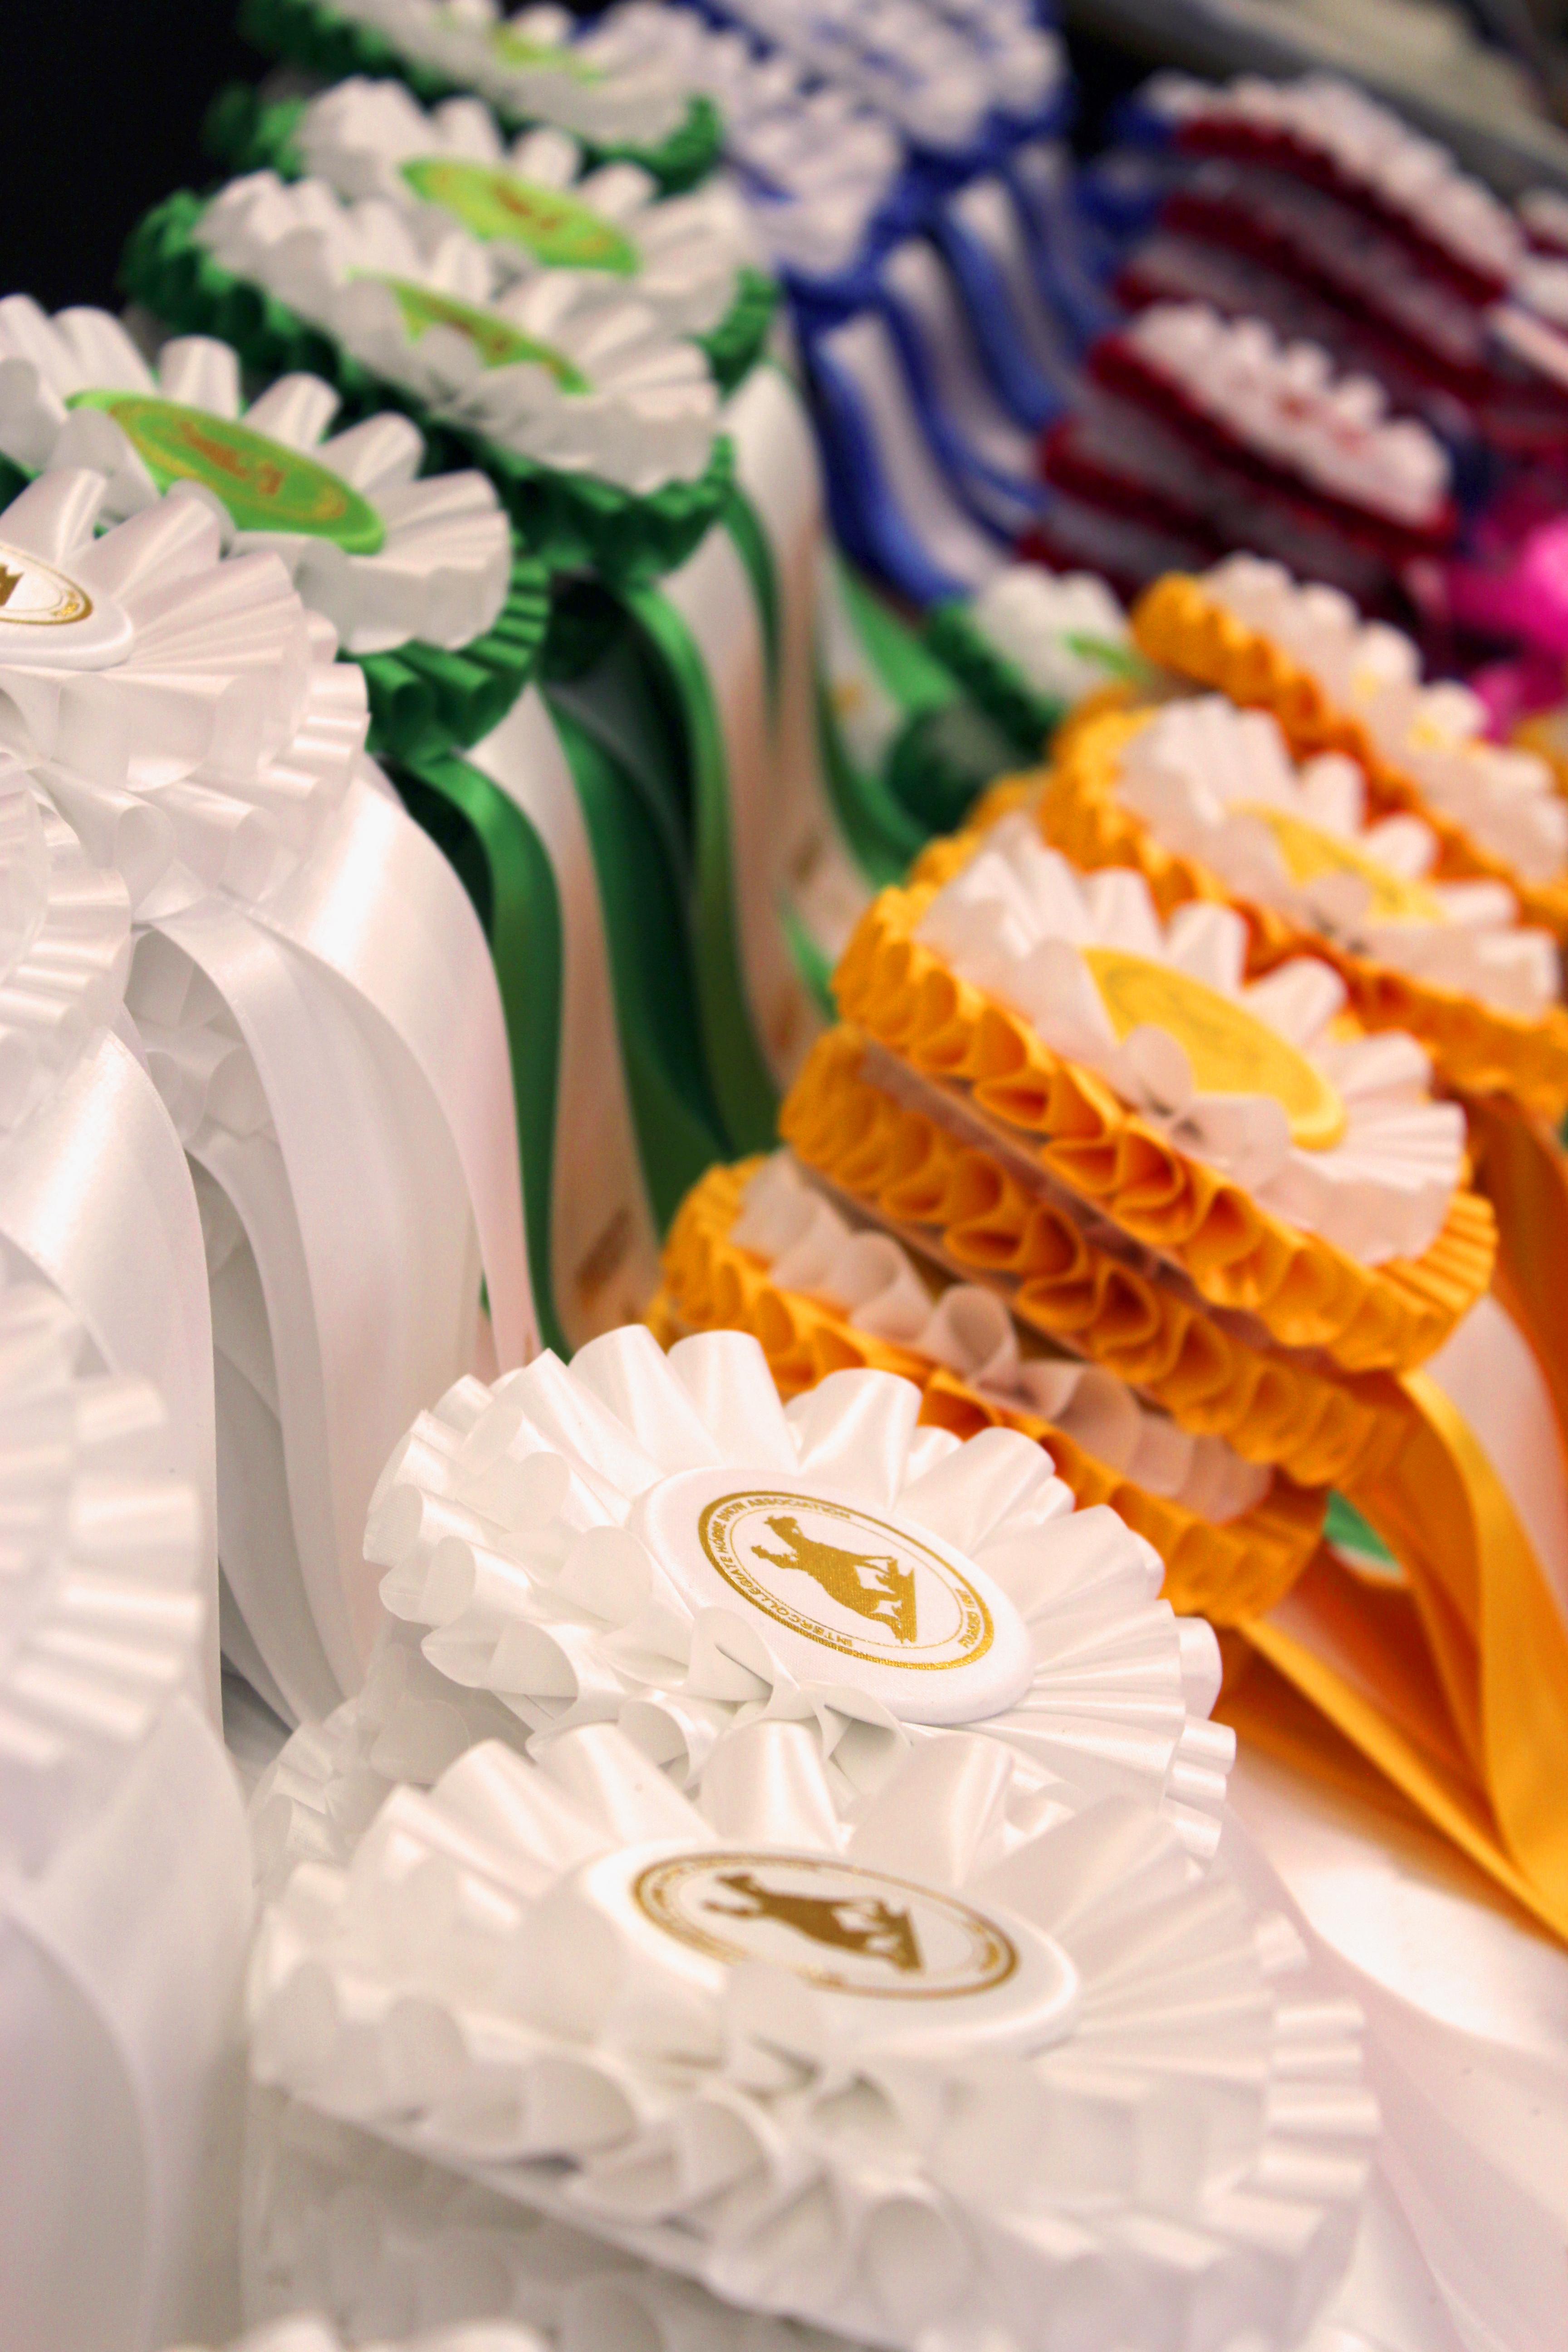 School Ribbons | Lincoln | Gold-N-Satin Ribbons